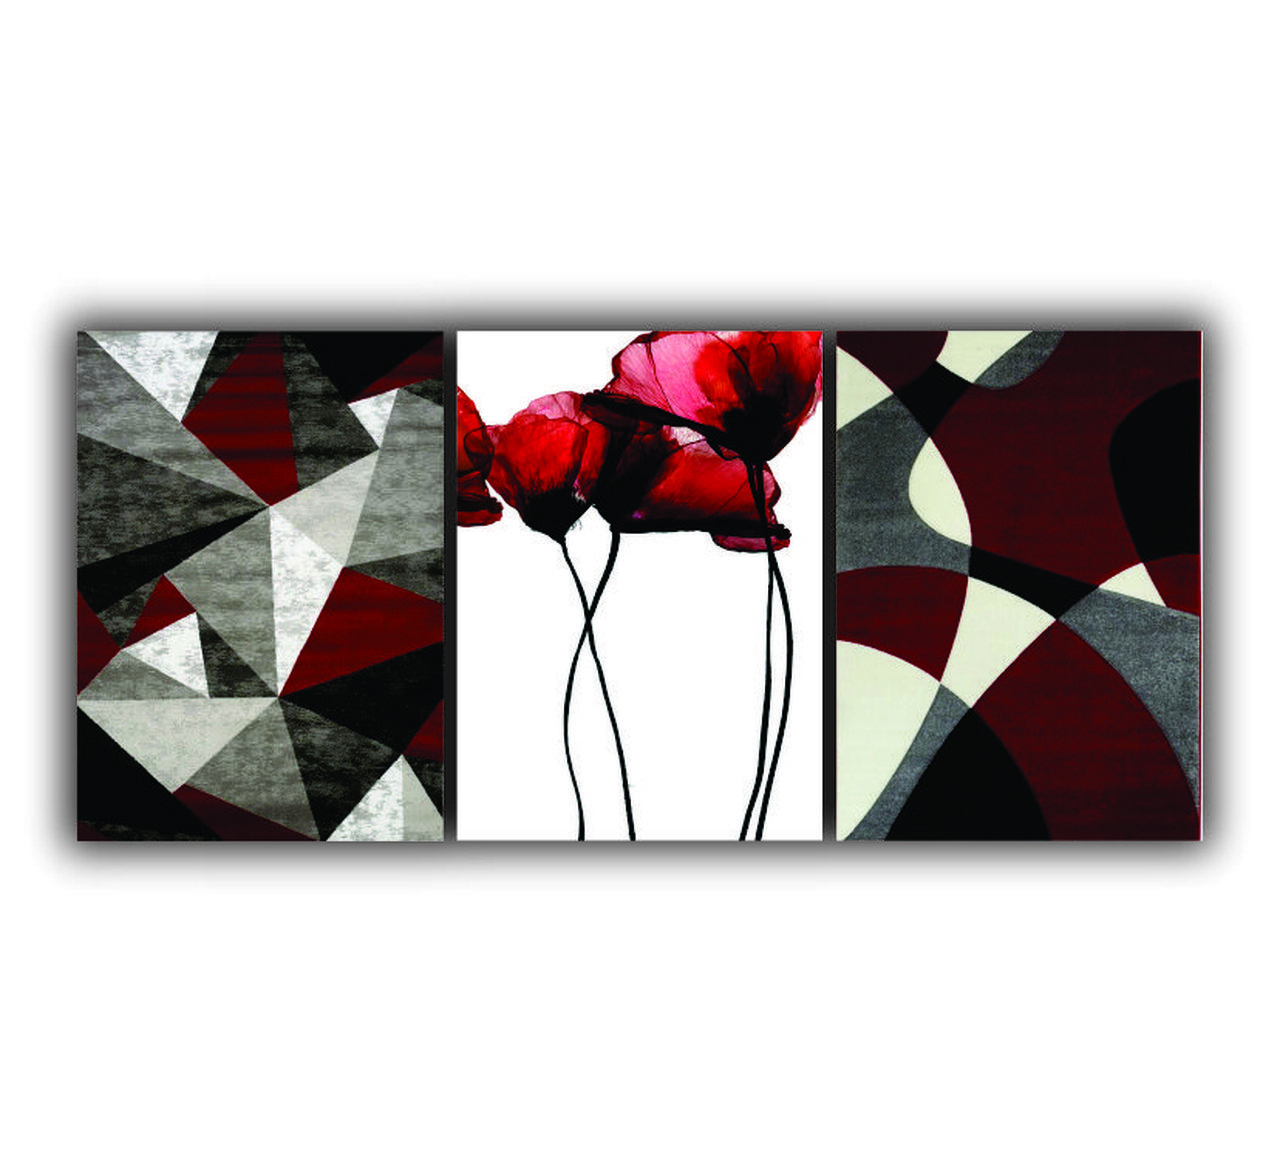 Quadro Geométrico Abstrato Vermelho Marsalla Flor - Kit 3 telas